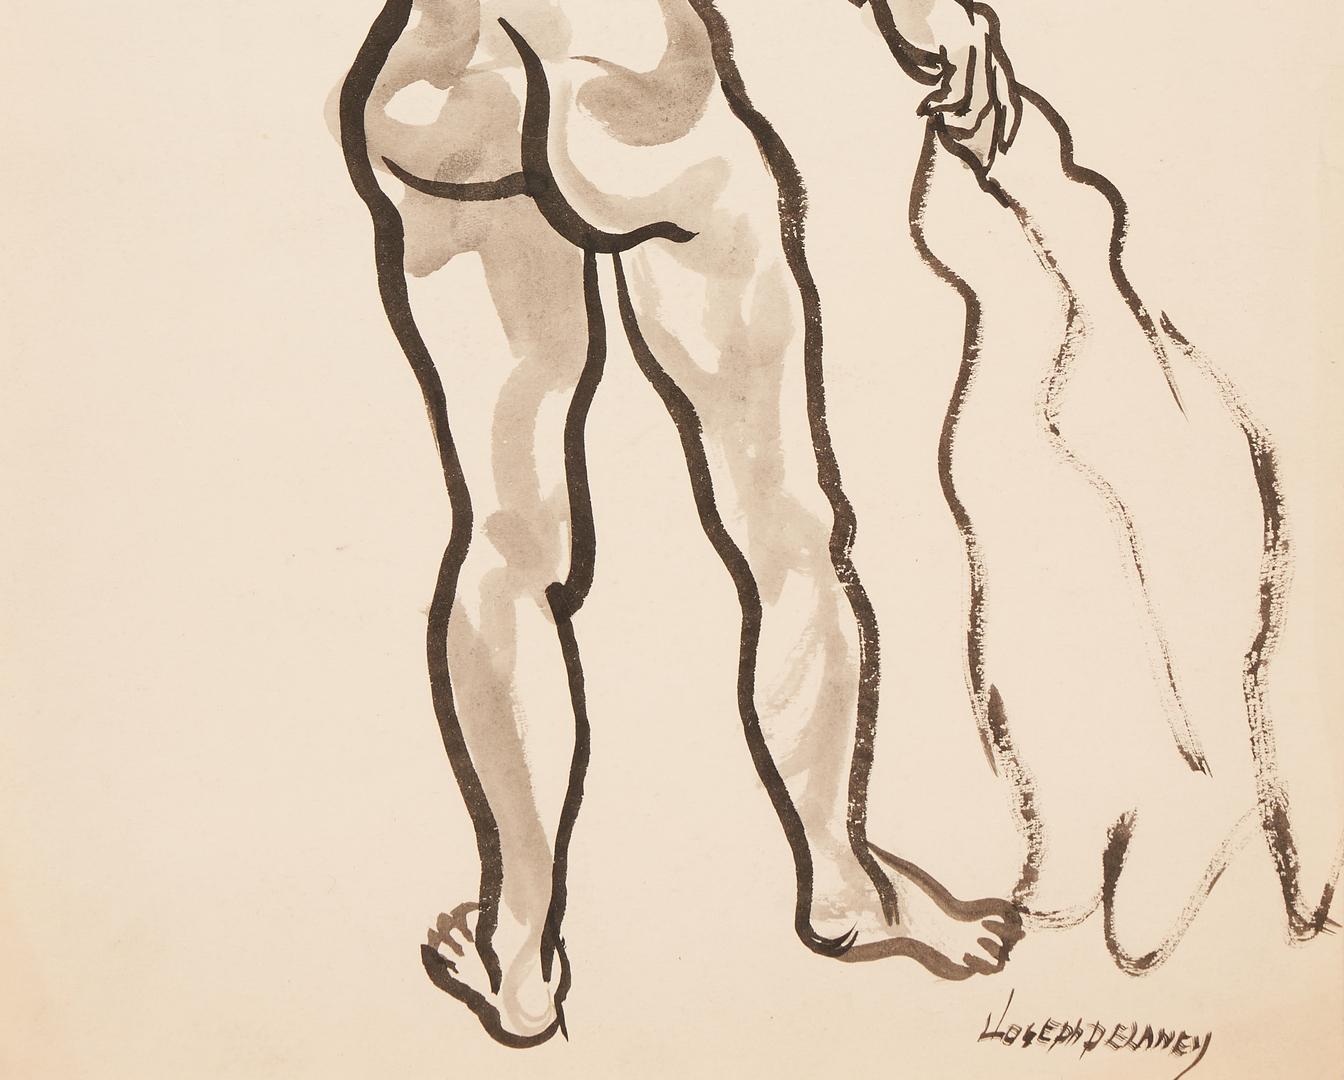 Lot 179: Joseph Delaney Nude Watercolor